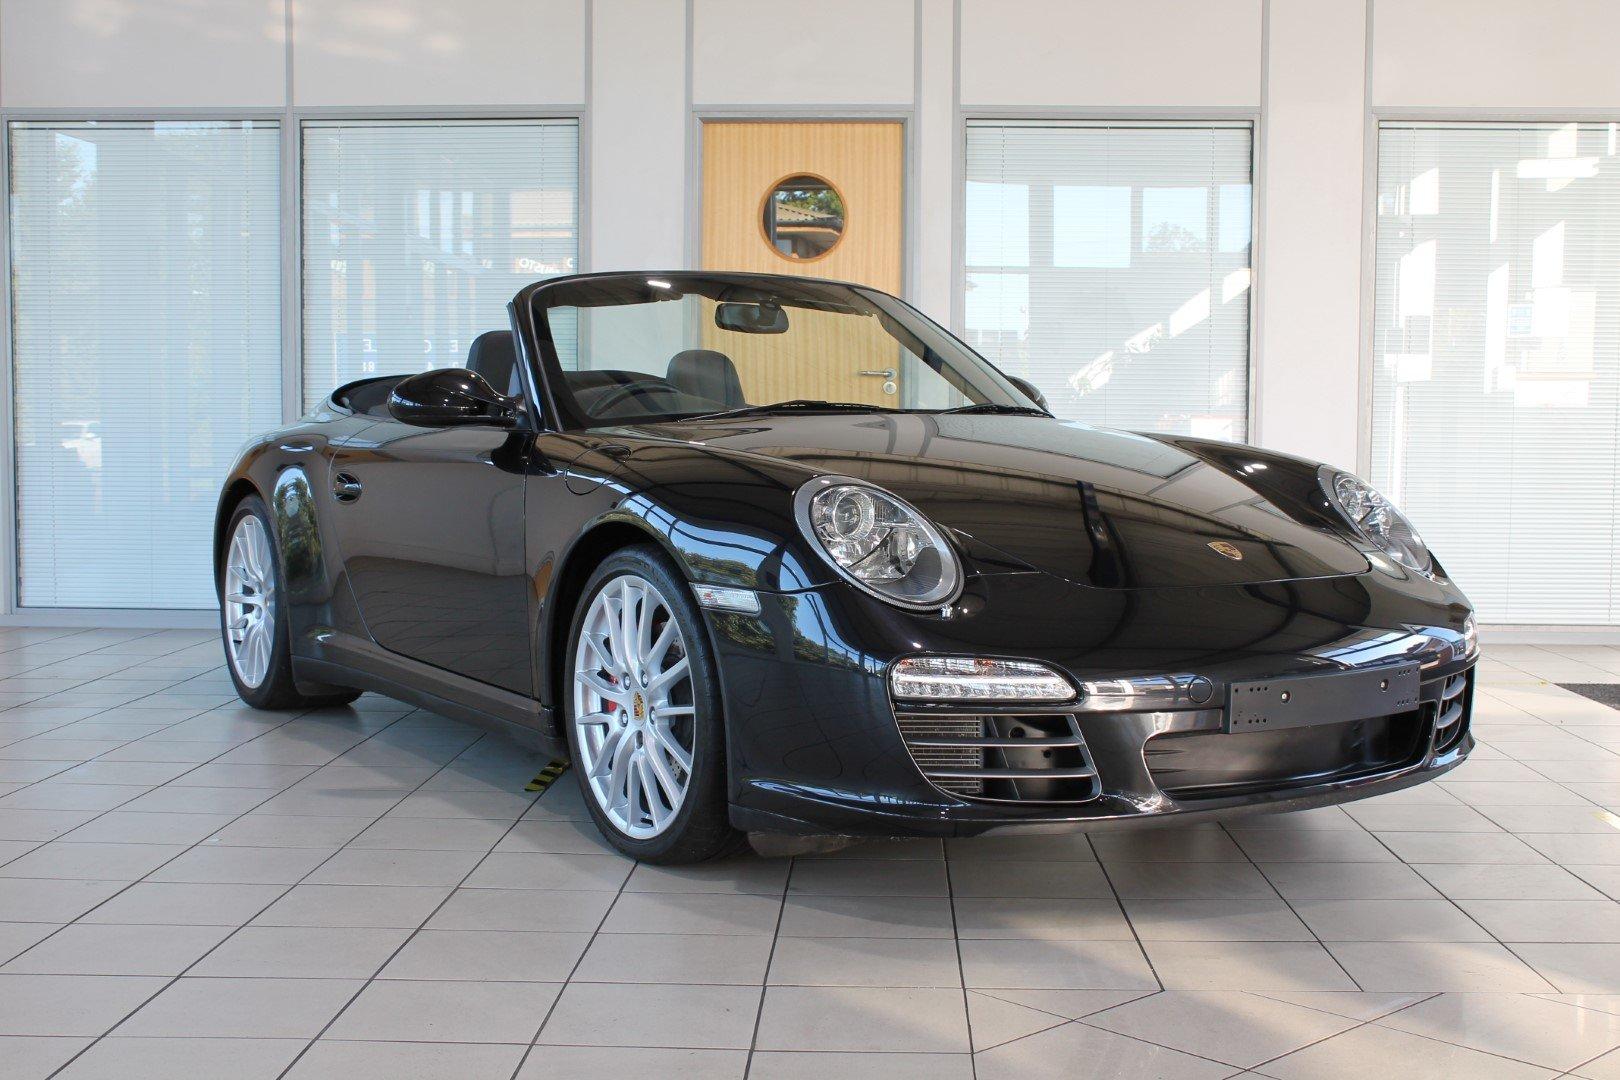 2009 Porsche 911 (997) 3.8 C4S PDK Cabriolet For Sale (picture 4 of 6)